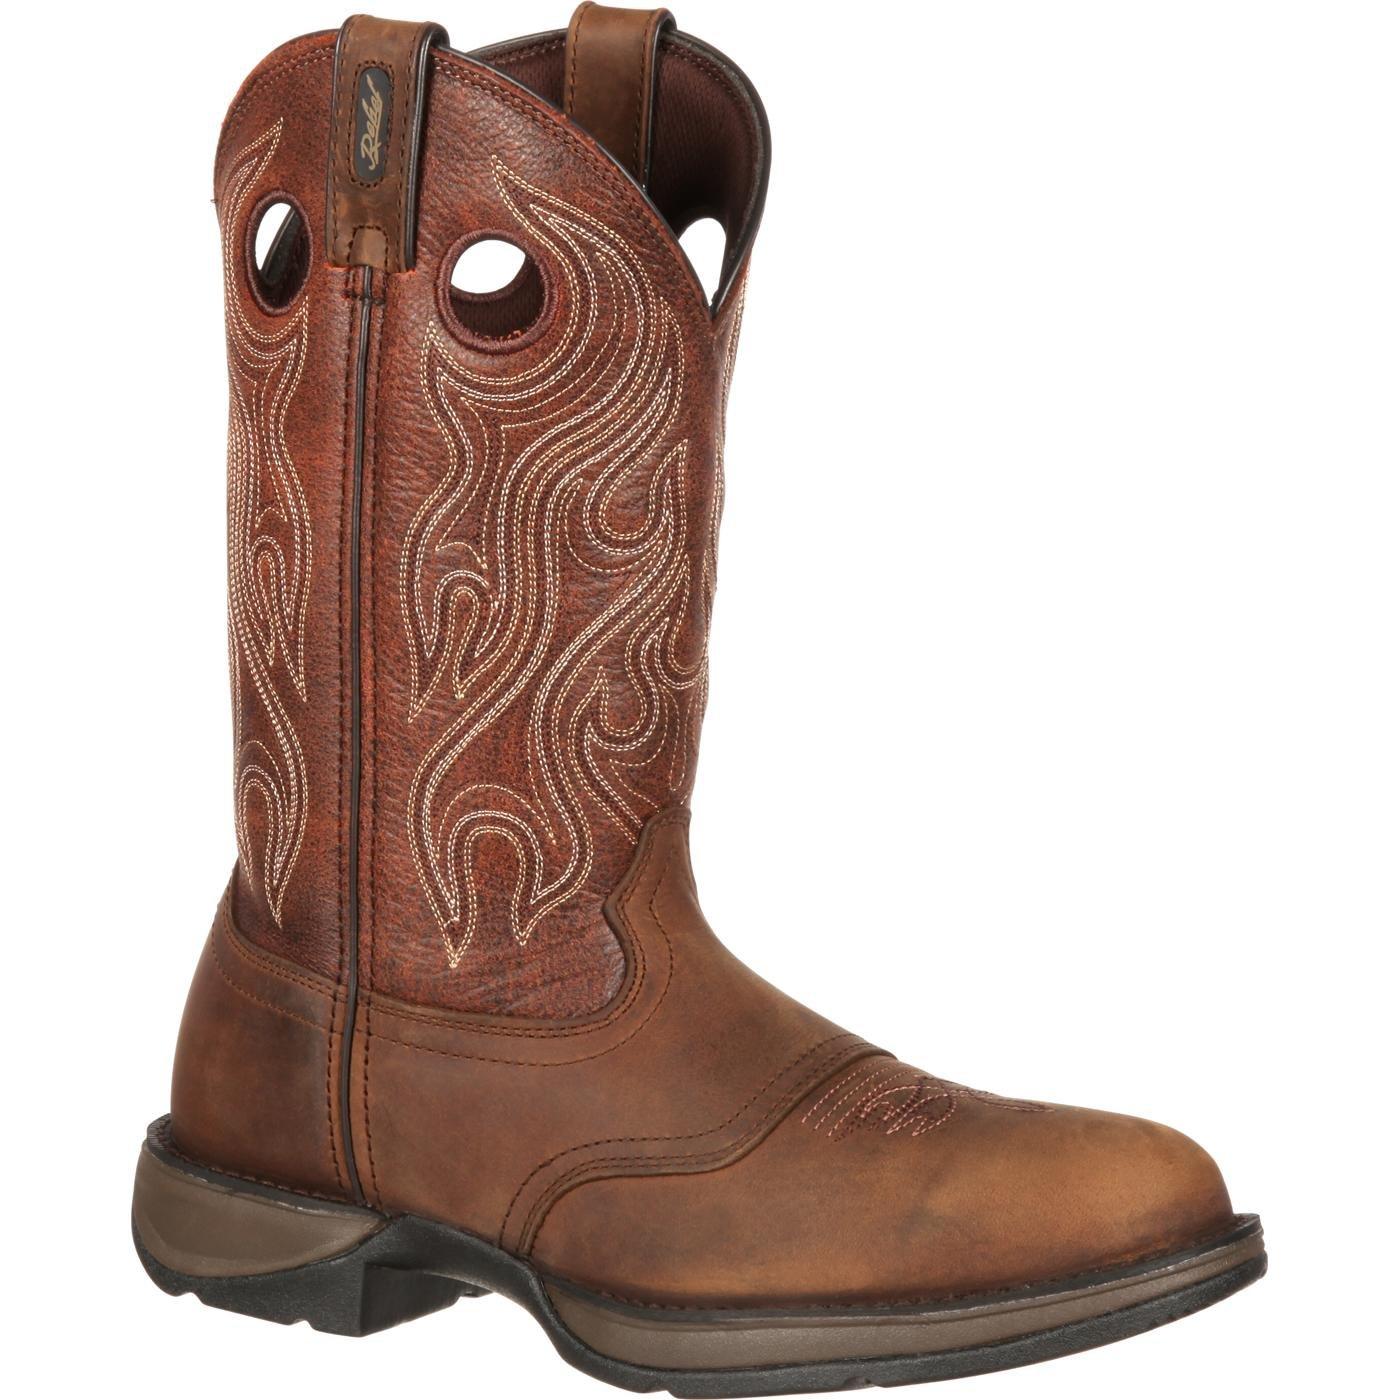 Durango Men's DB5474 Western Boot, Dusk Velocity/bark Brown, 10 M US